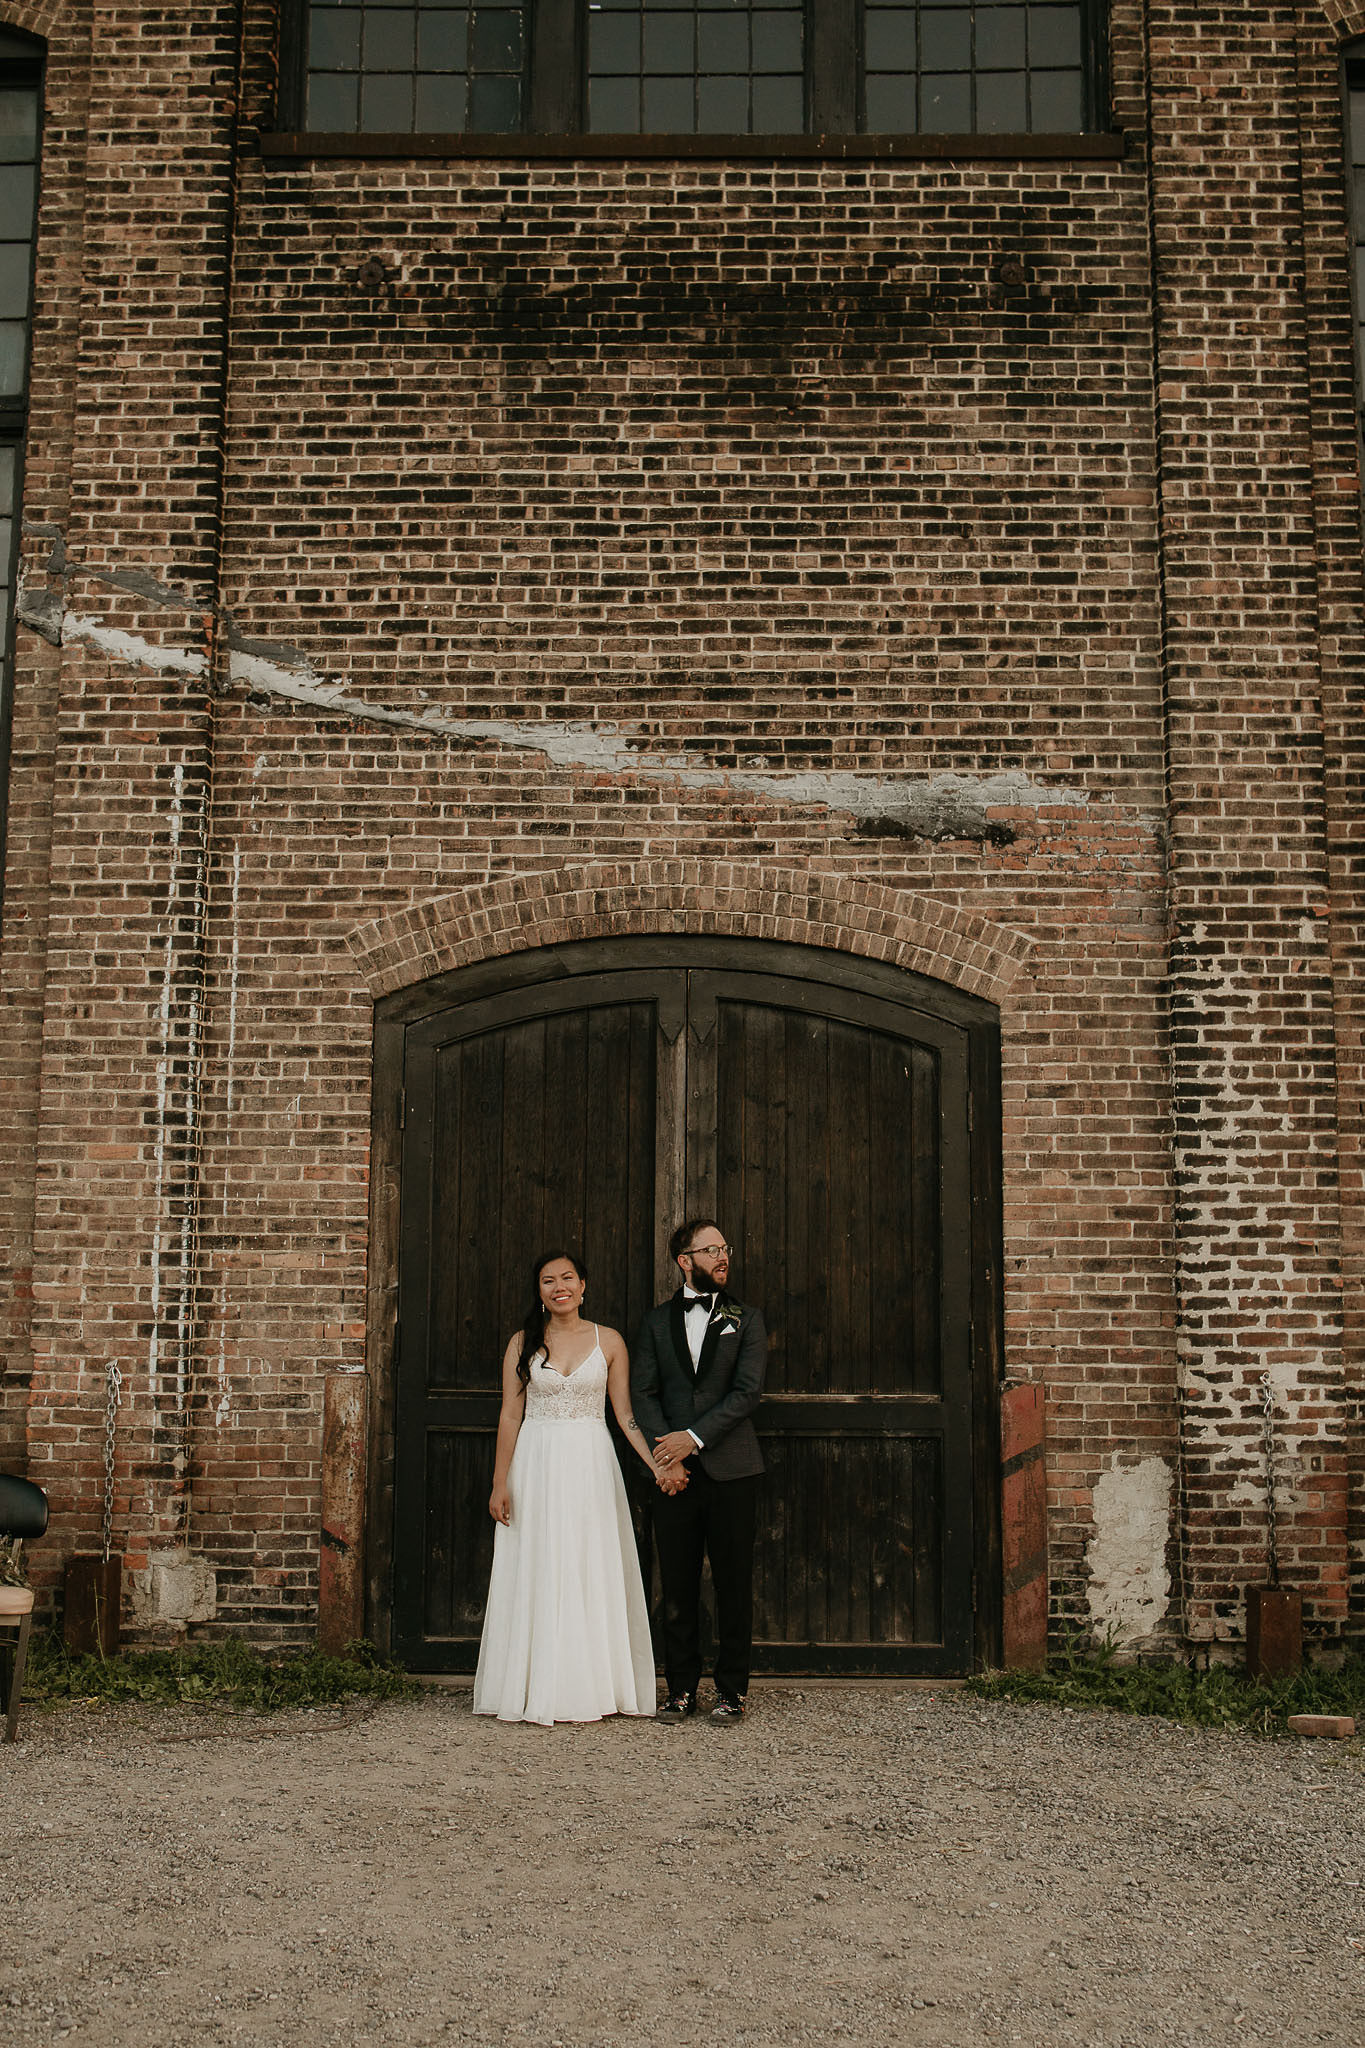 Jess+Matt_wedding-392.JPG